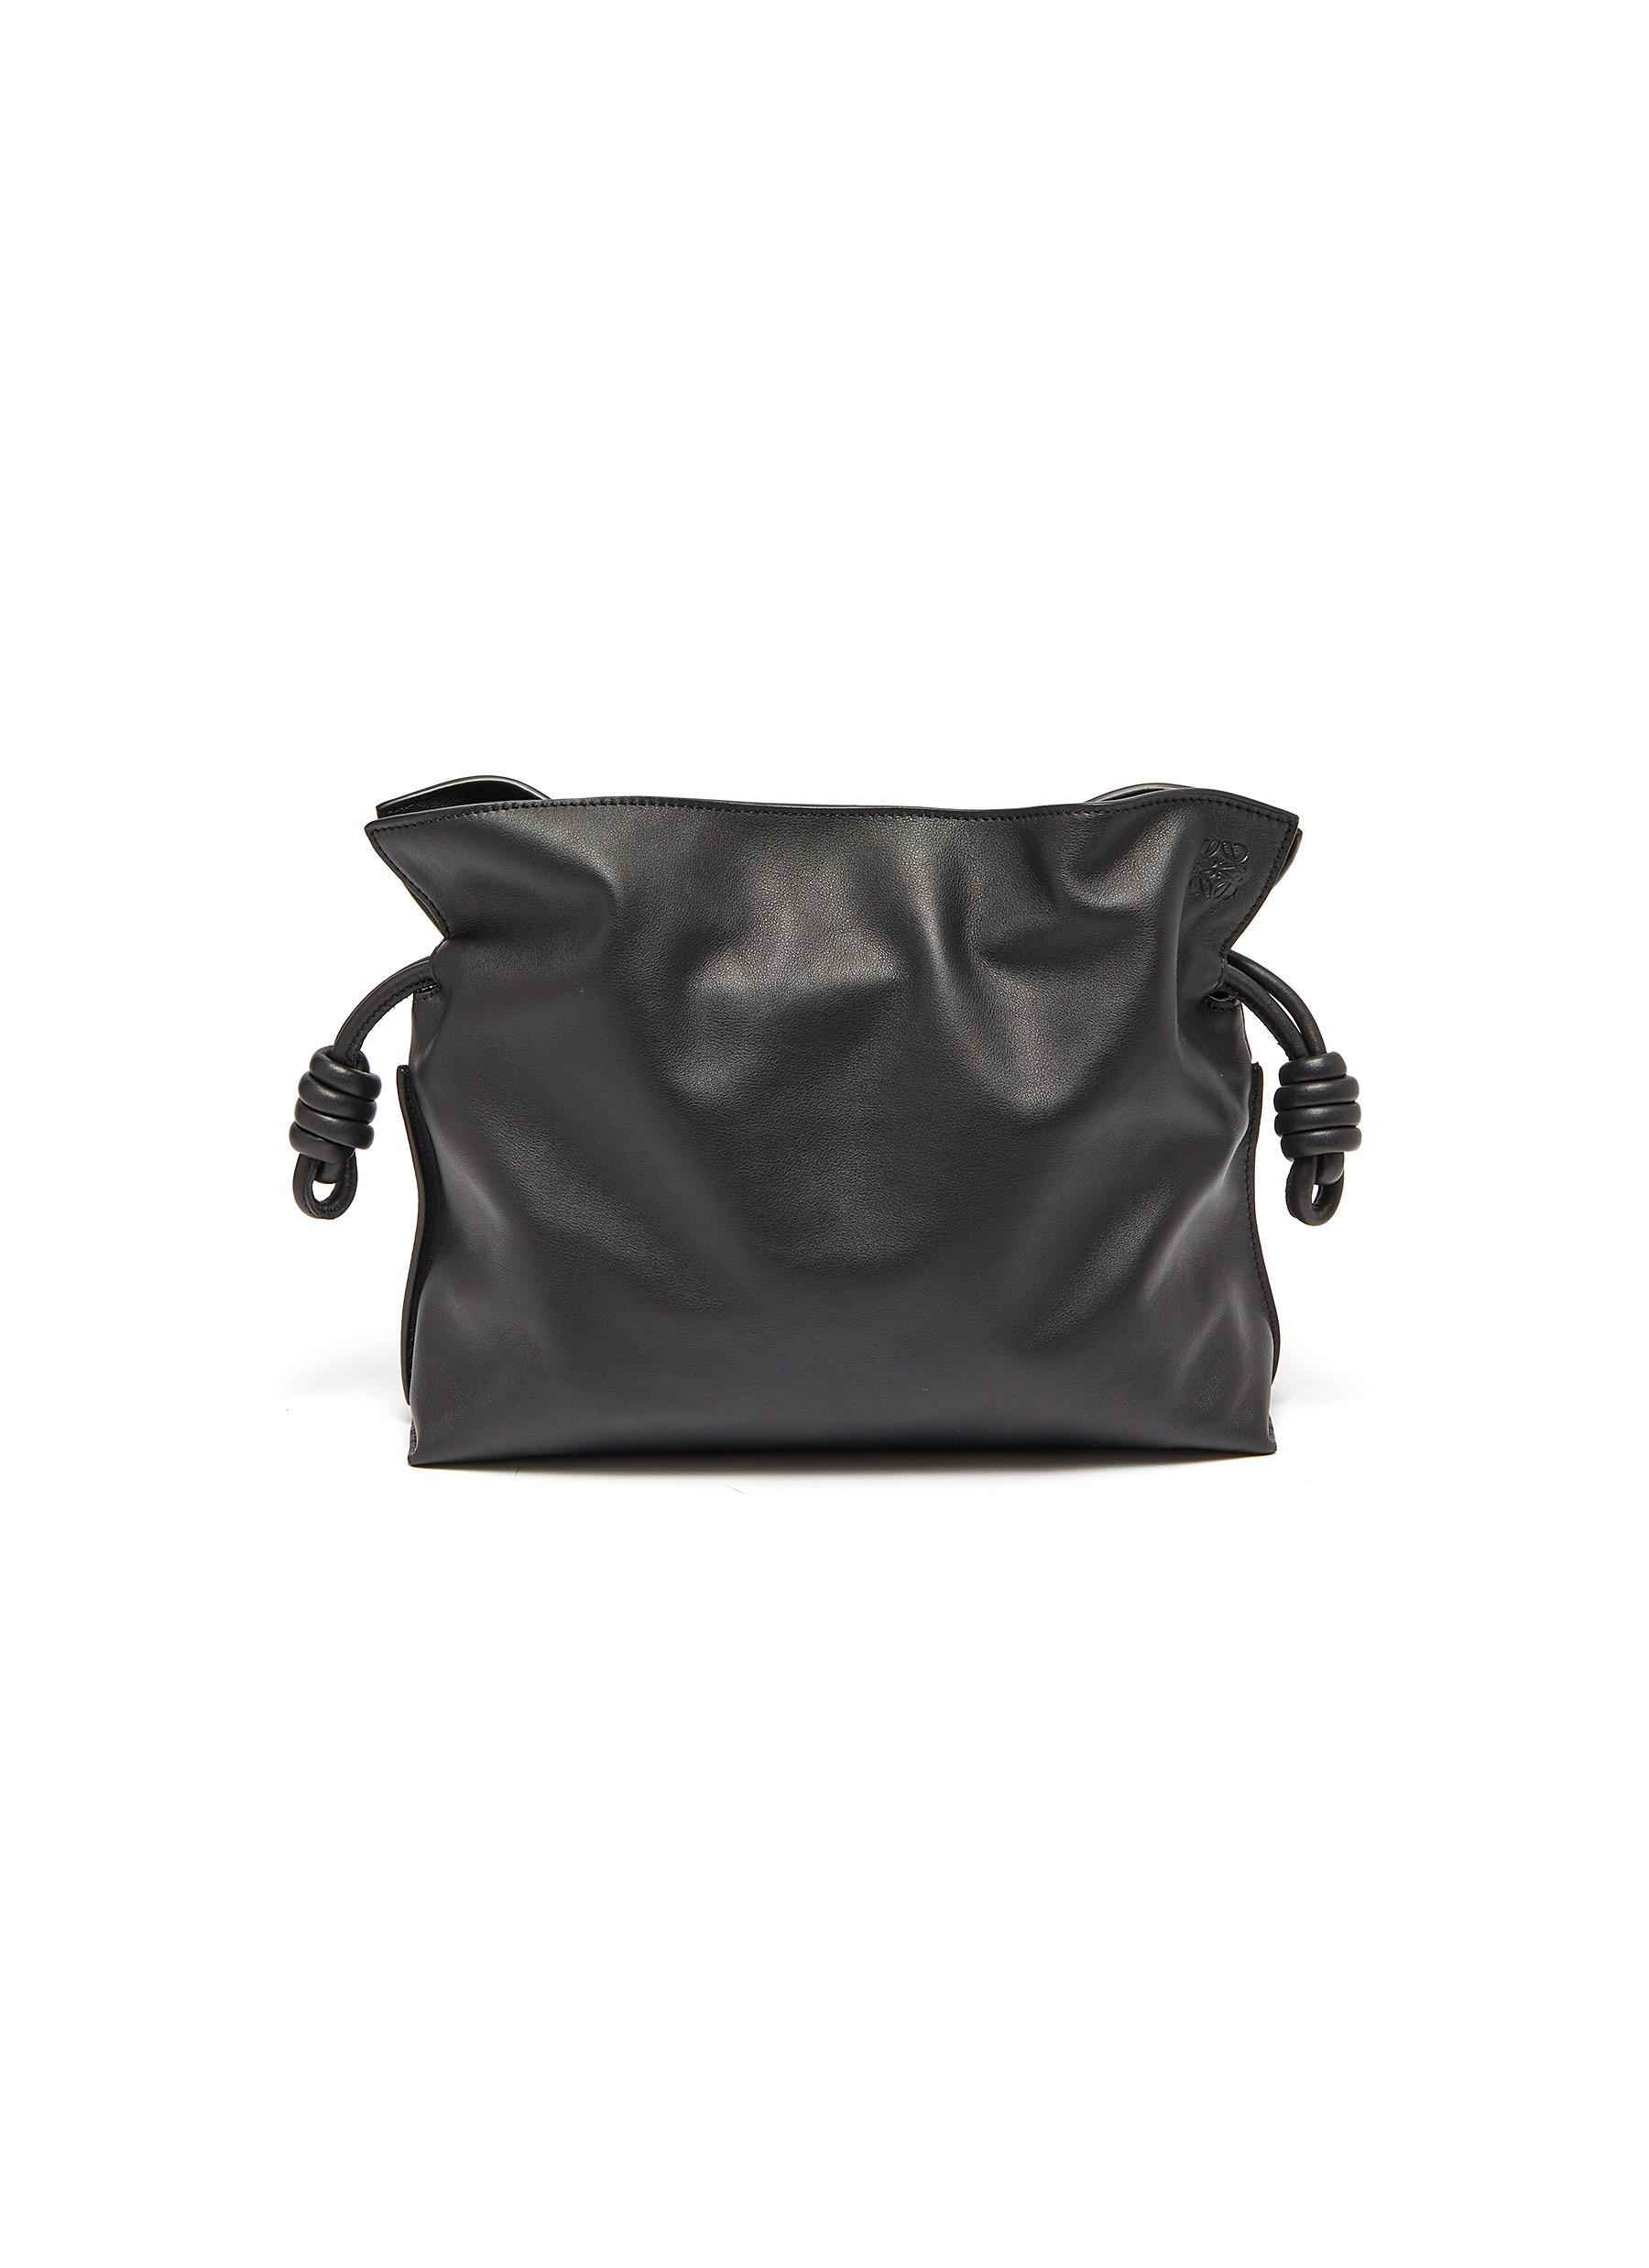 Flamenco' leather clutch